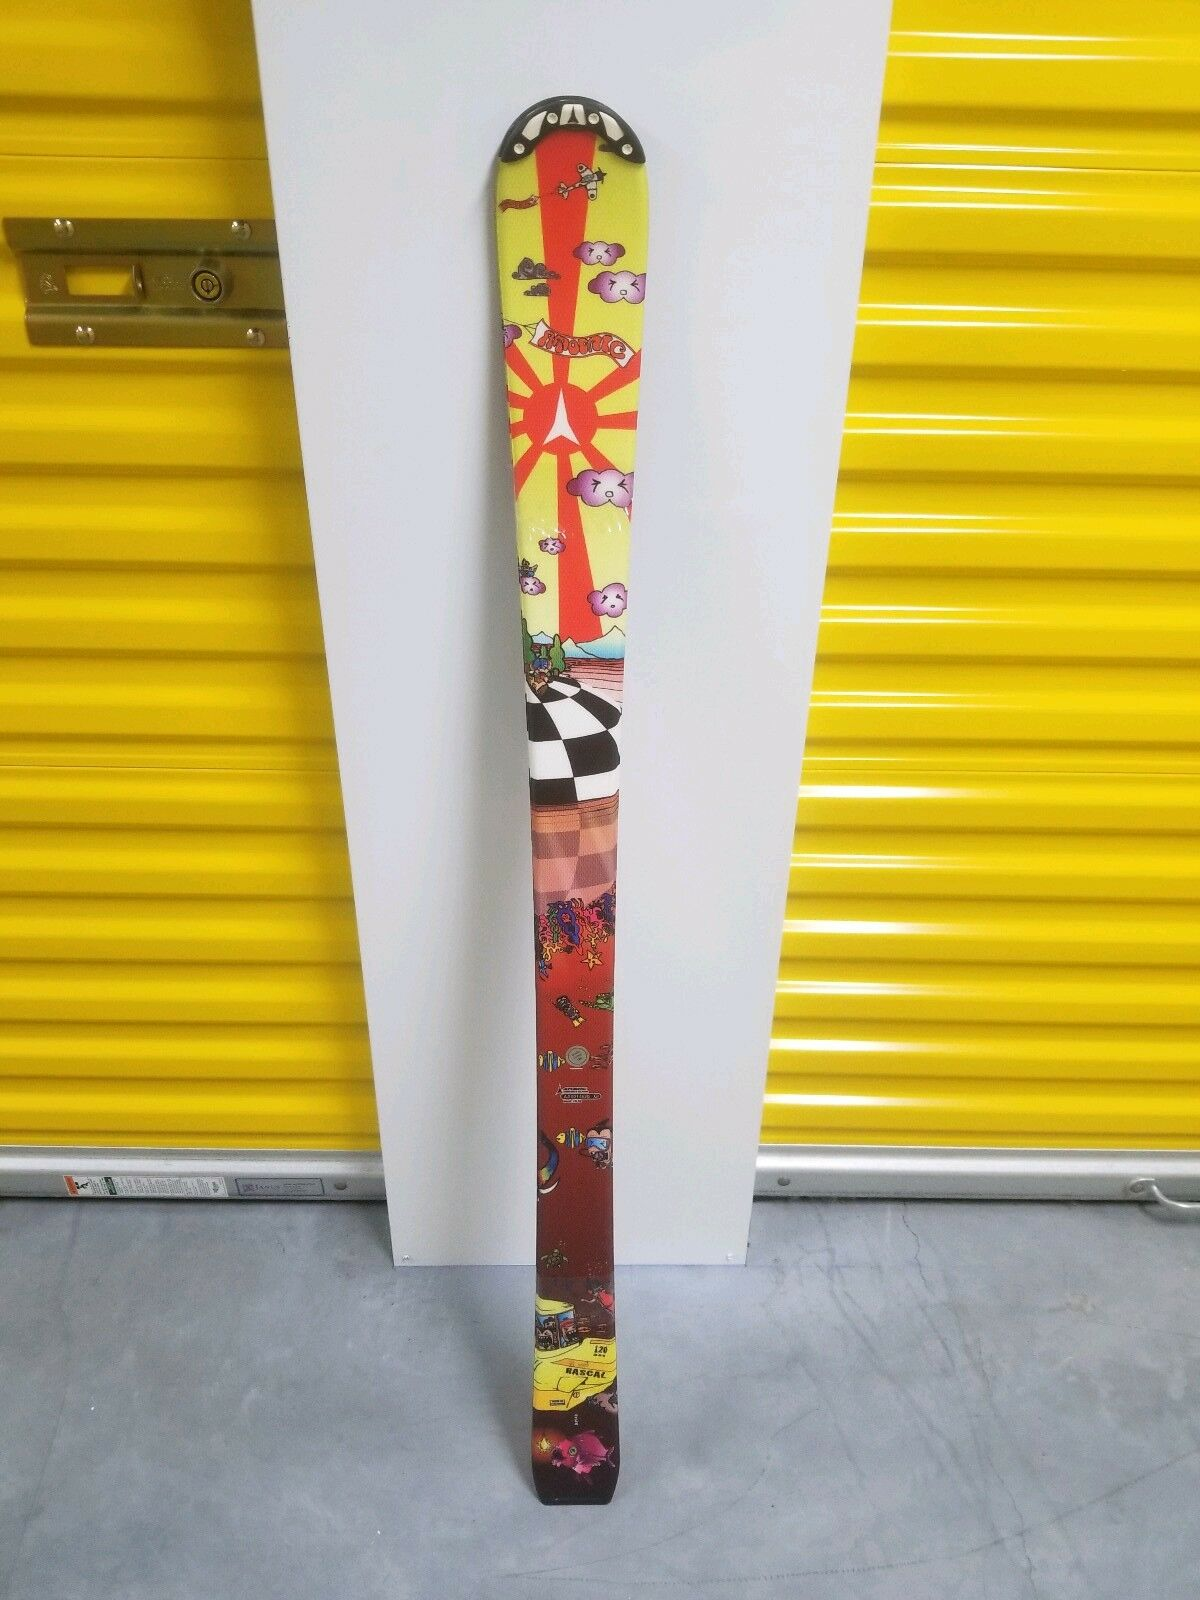 New  Pair of Atomic rascal 120 skis